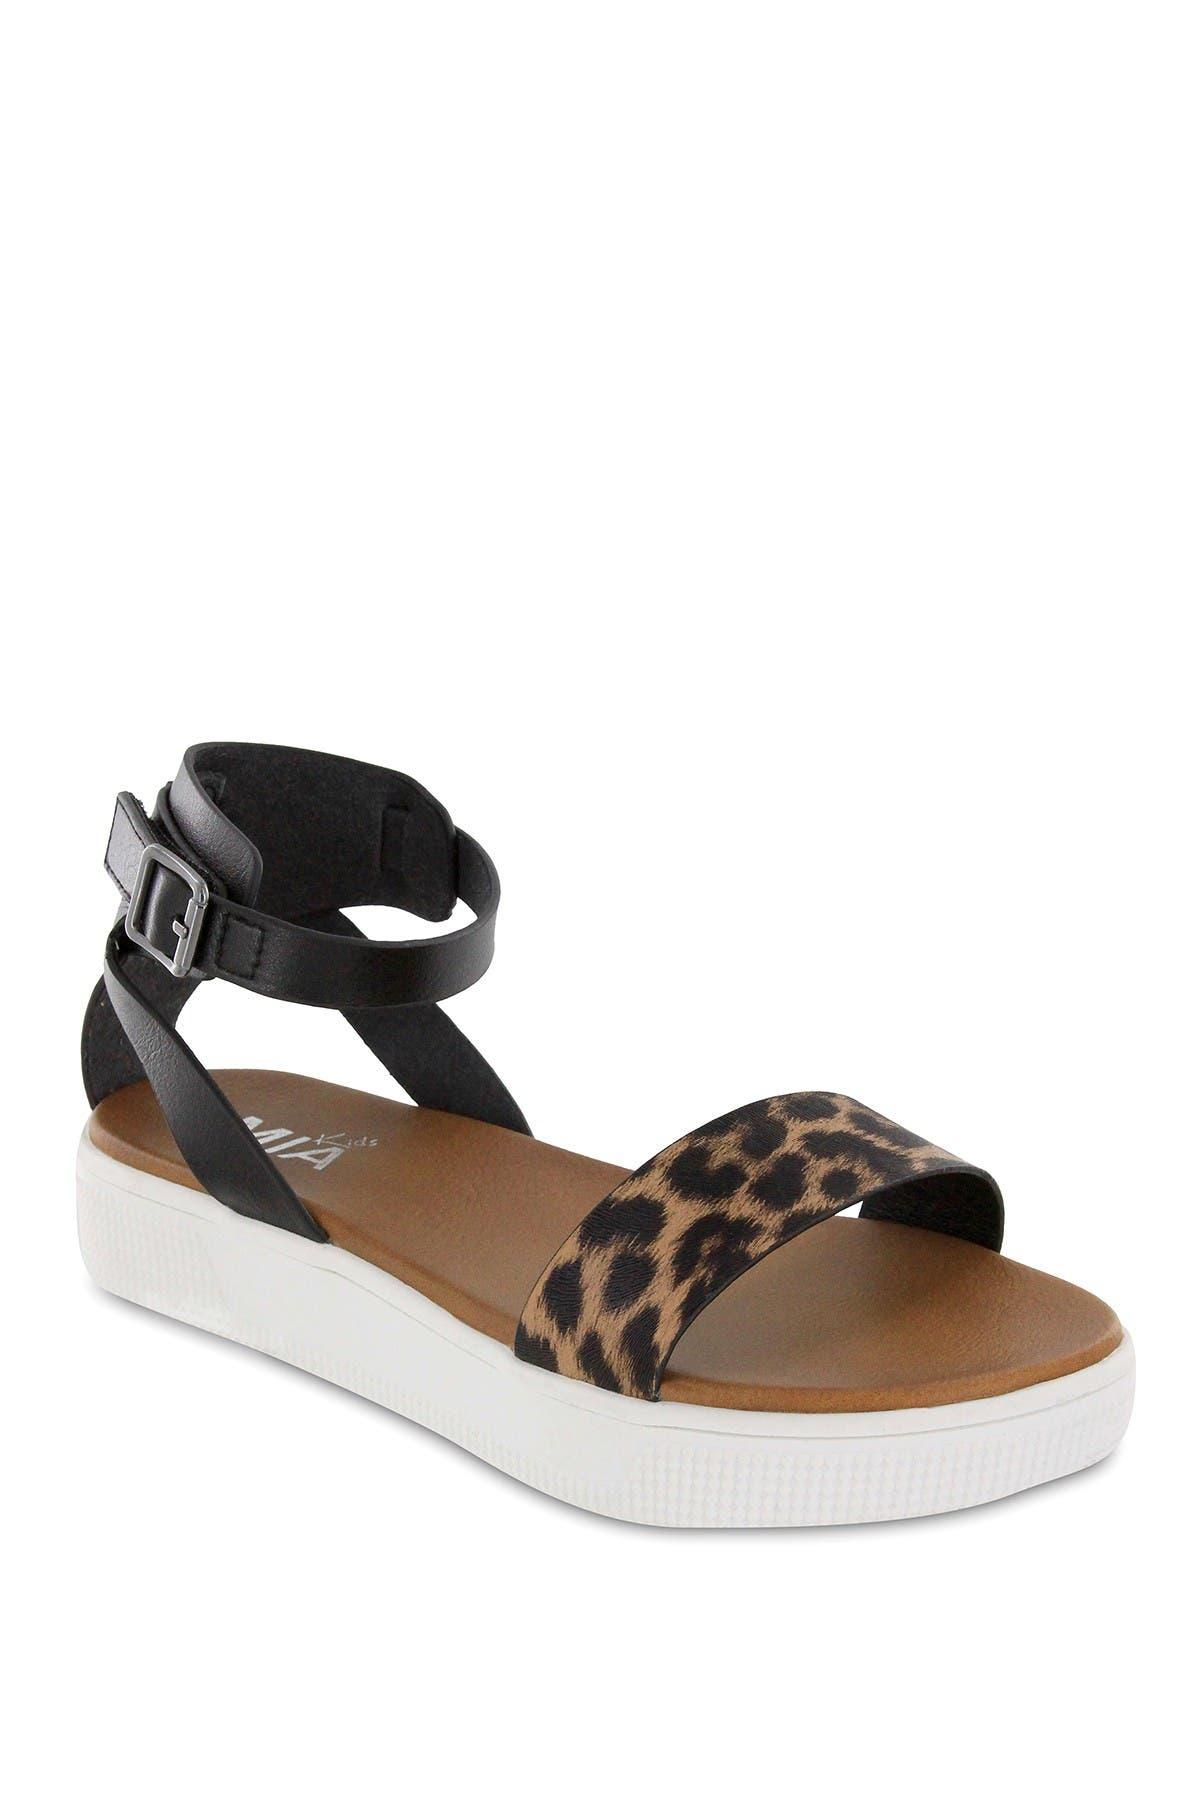 Image of MIA Little Ellen Flatform Sandal